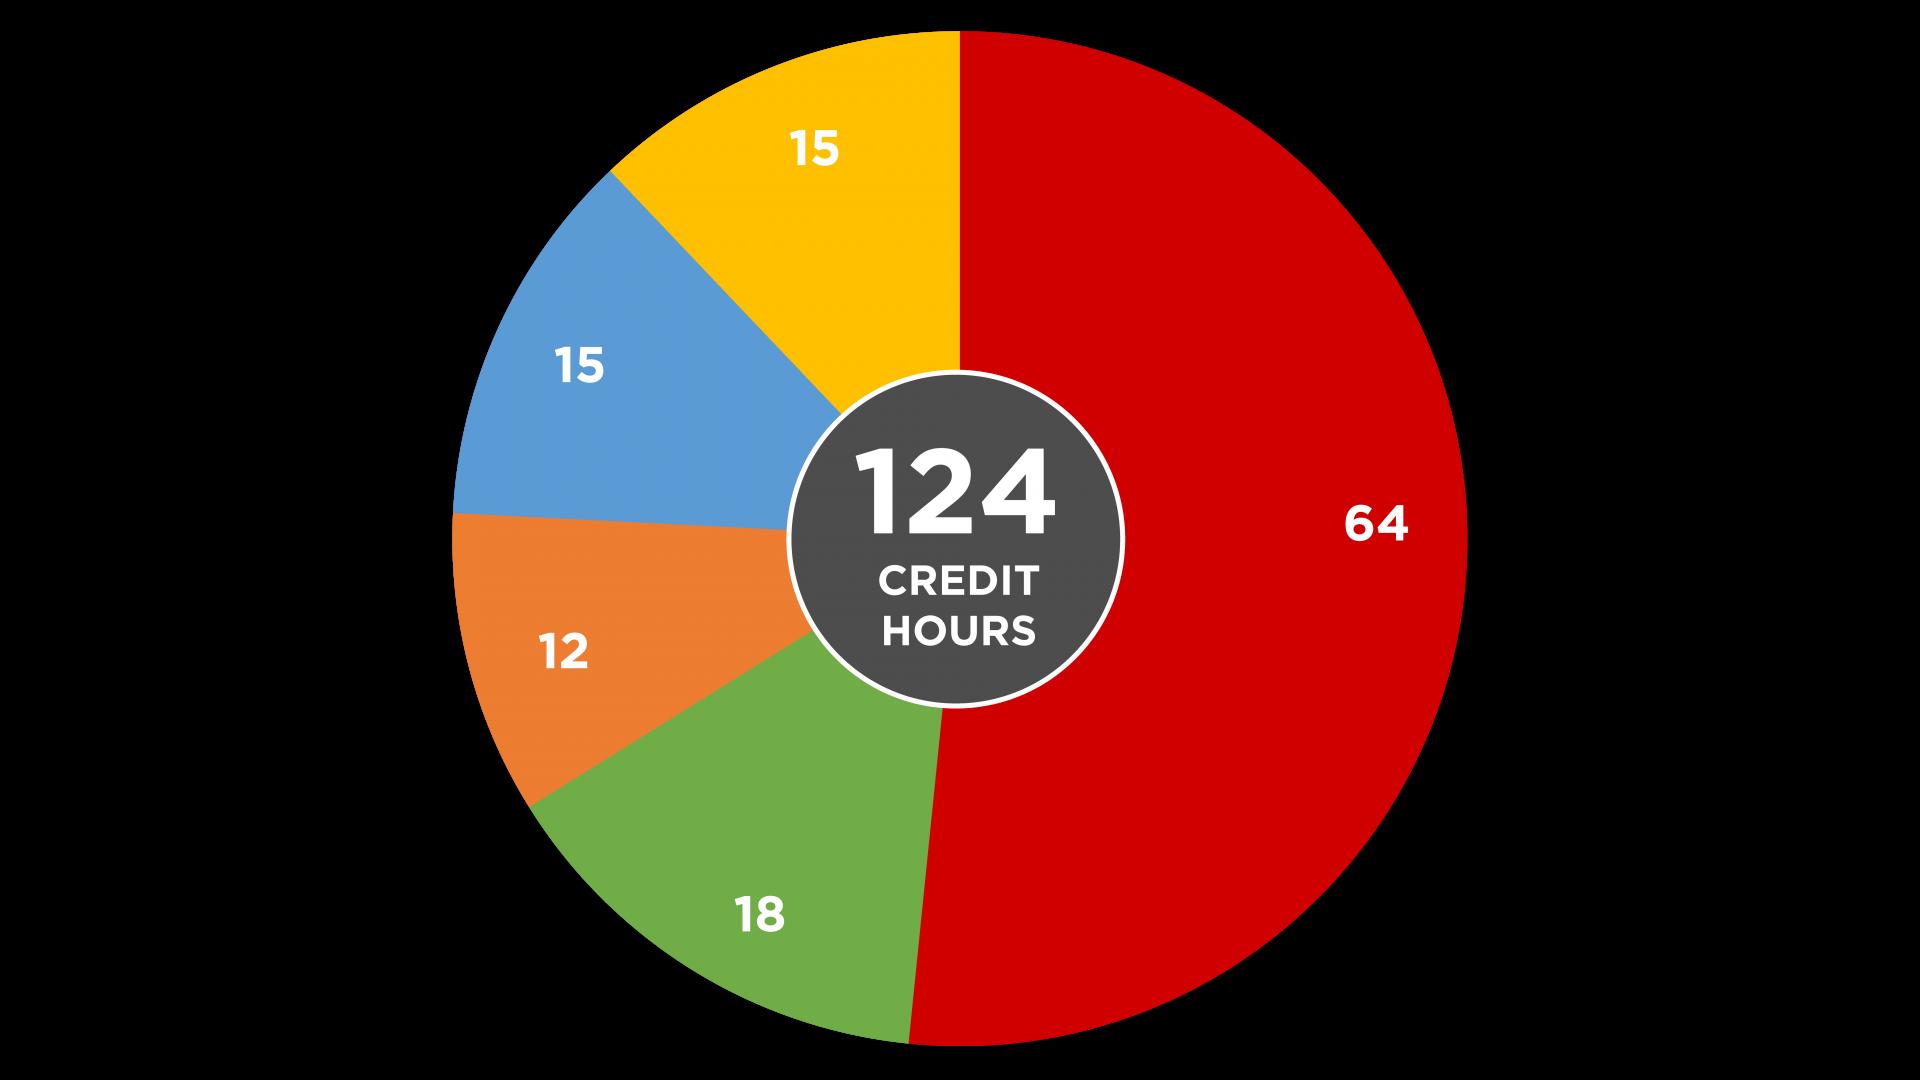 Software Engineering Credit Hours Per Major Circle Graph